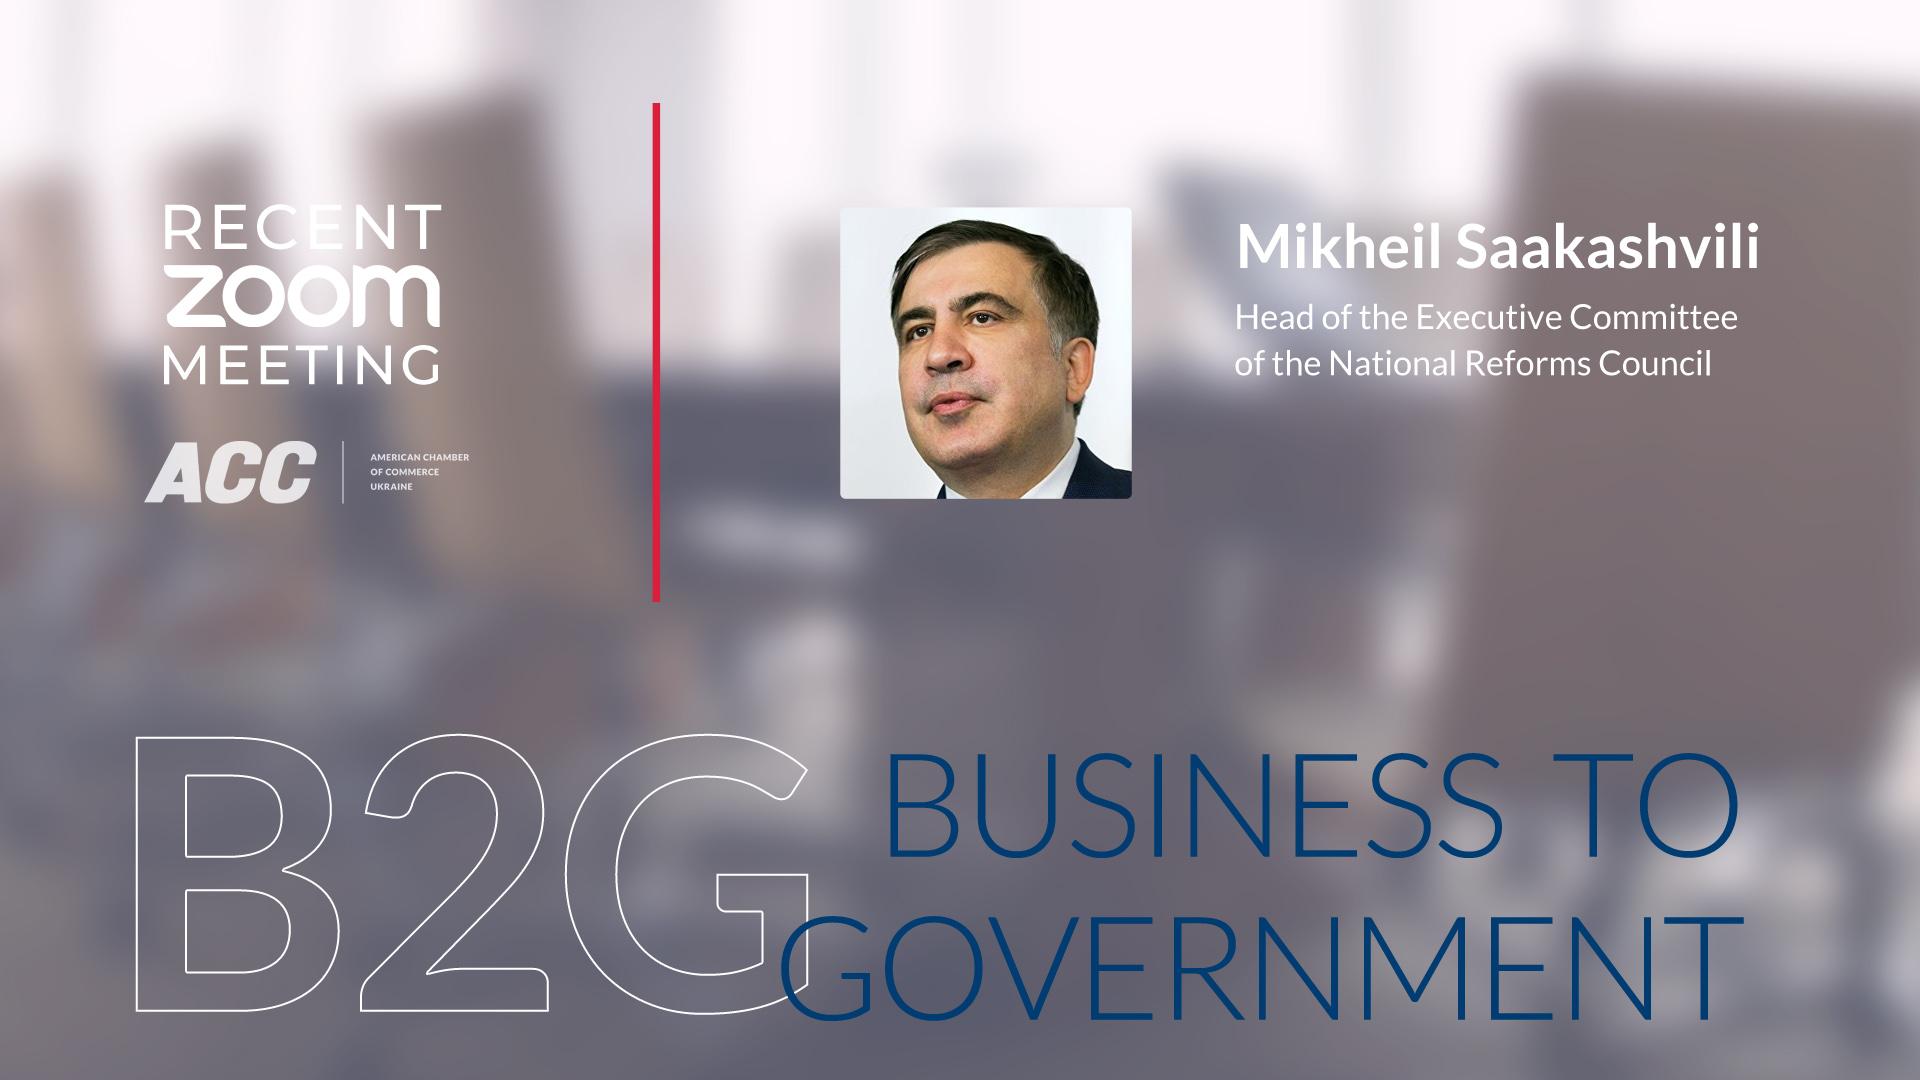 Американська торговельна палата зустрілася з Міхеілом Саакашвілі